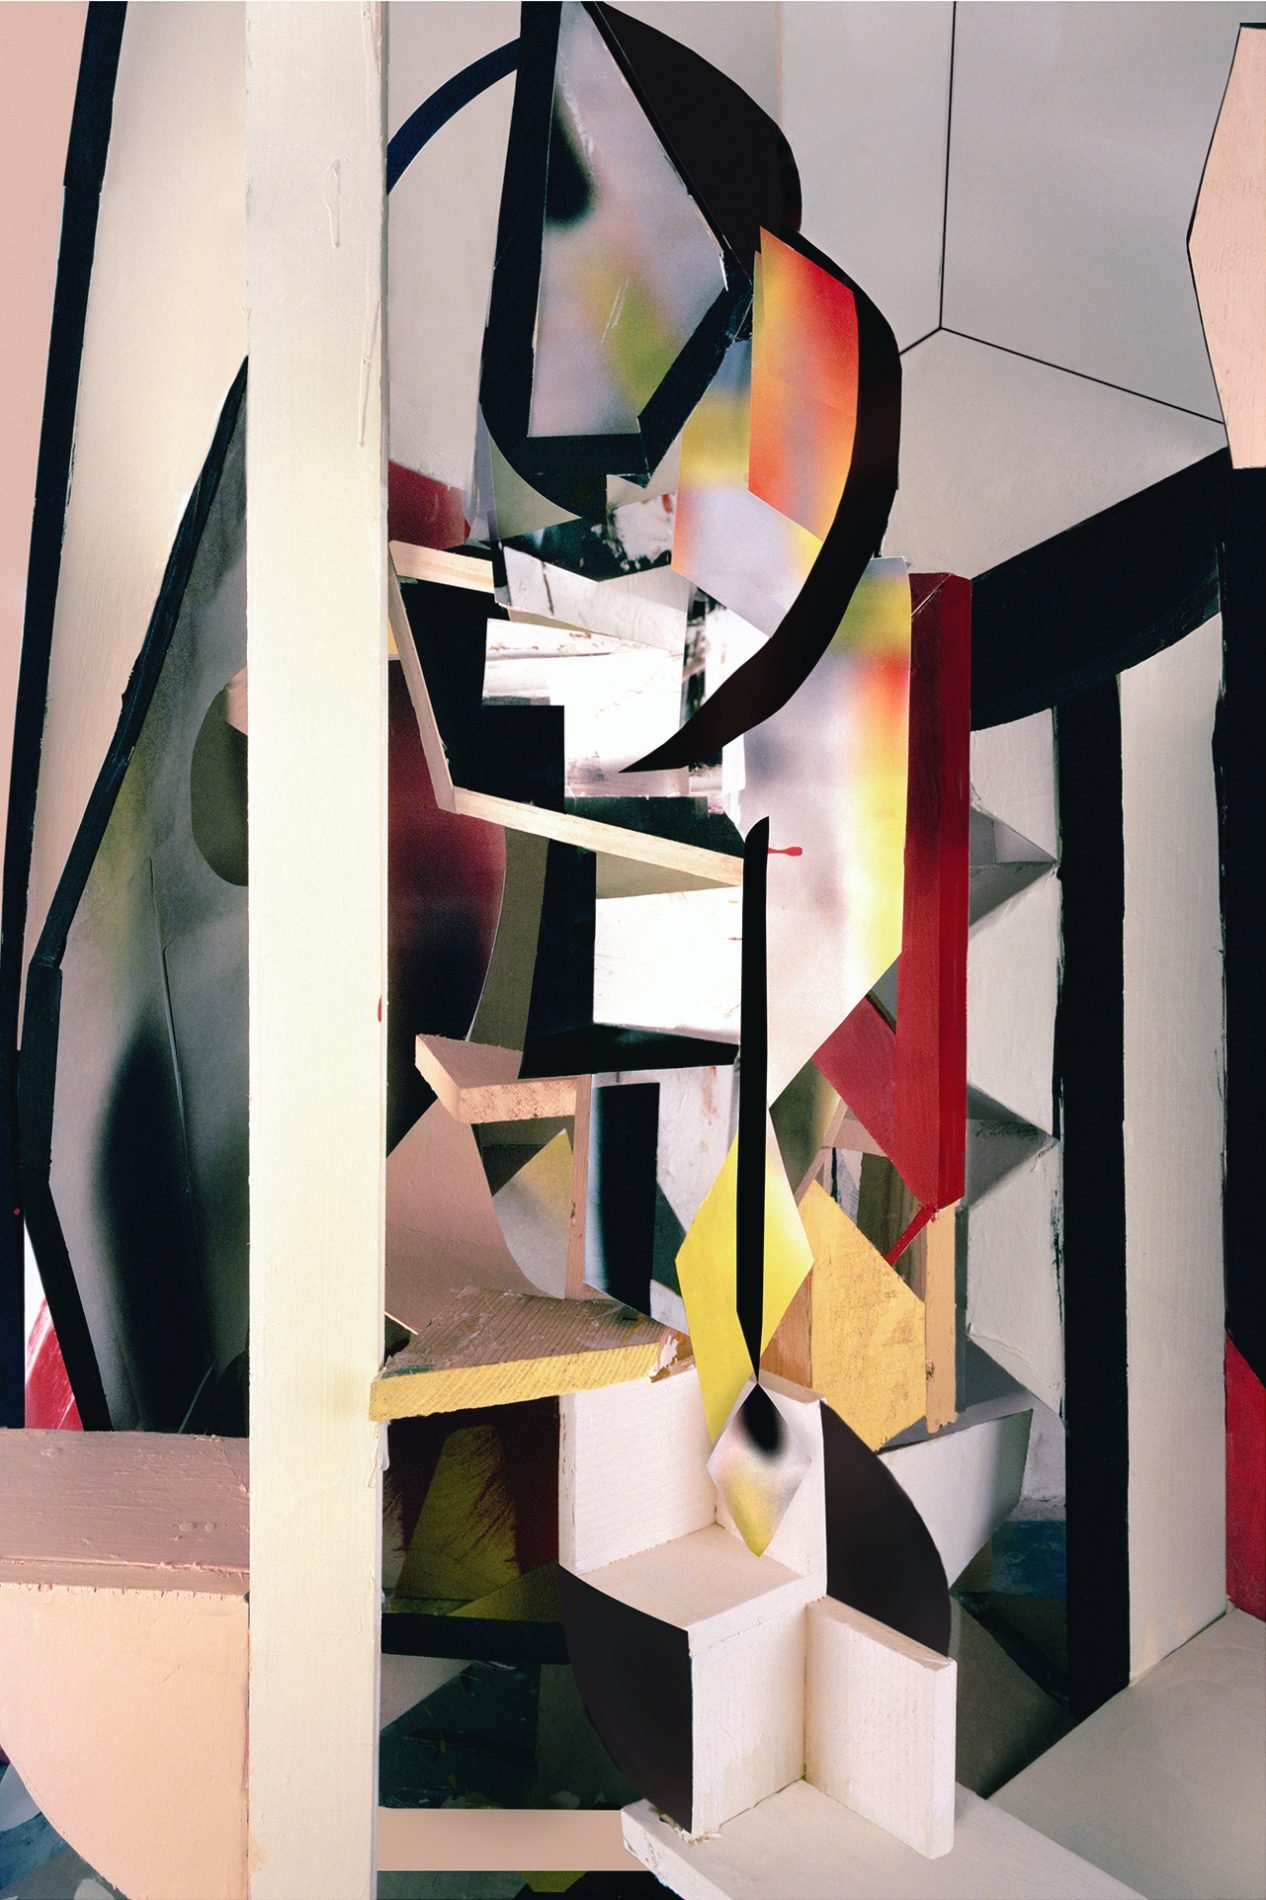 Yamini Nayar , Come to Rest,  2018, Lightjet print, 40 x 60 inches (101.6 x 125.4 cm), Edition of 5 + 2AP